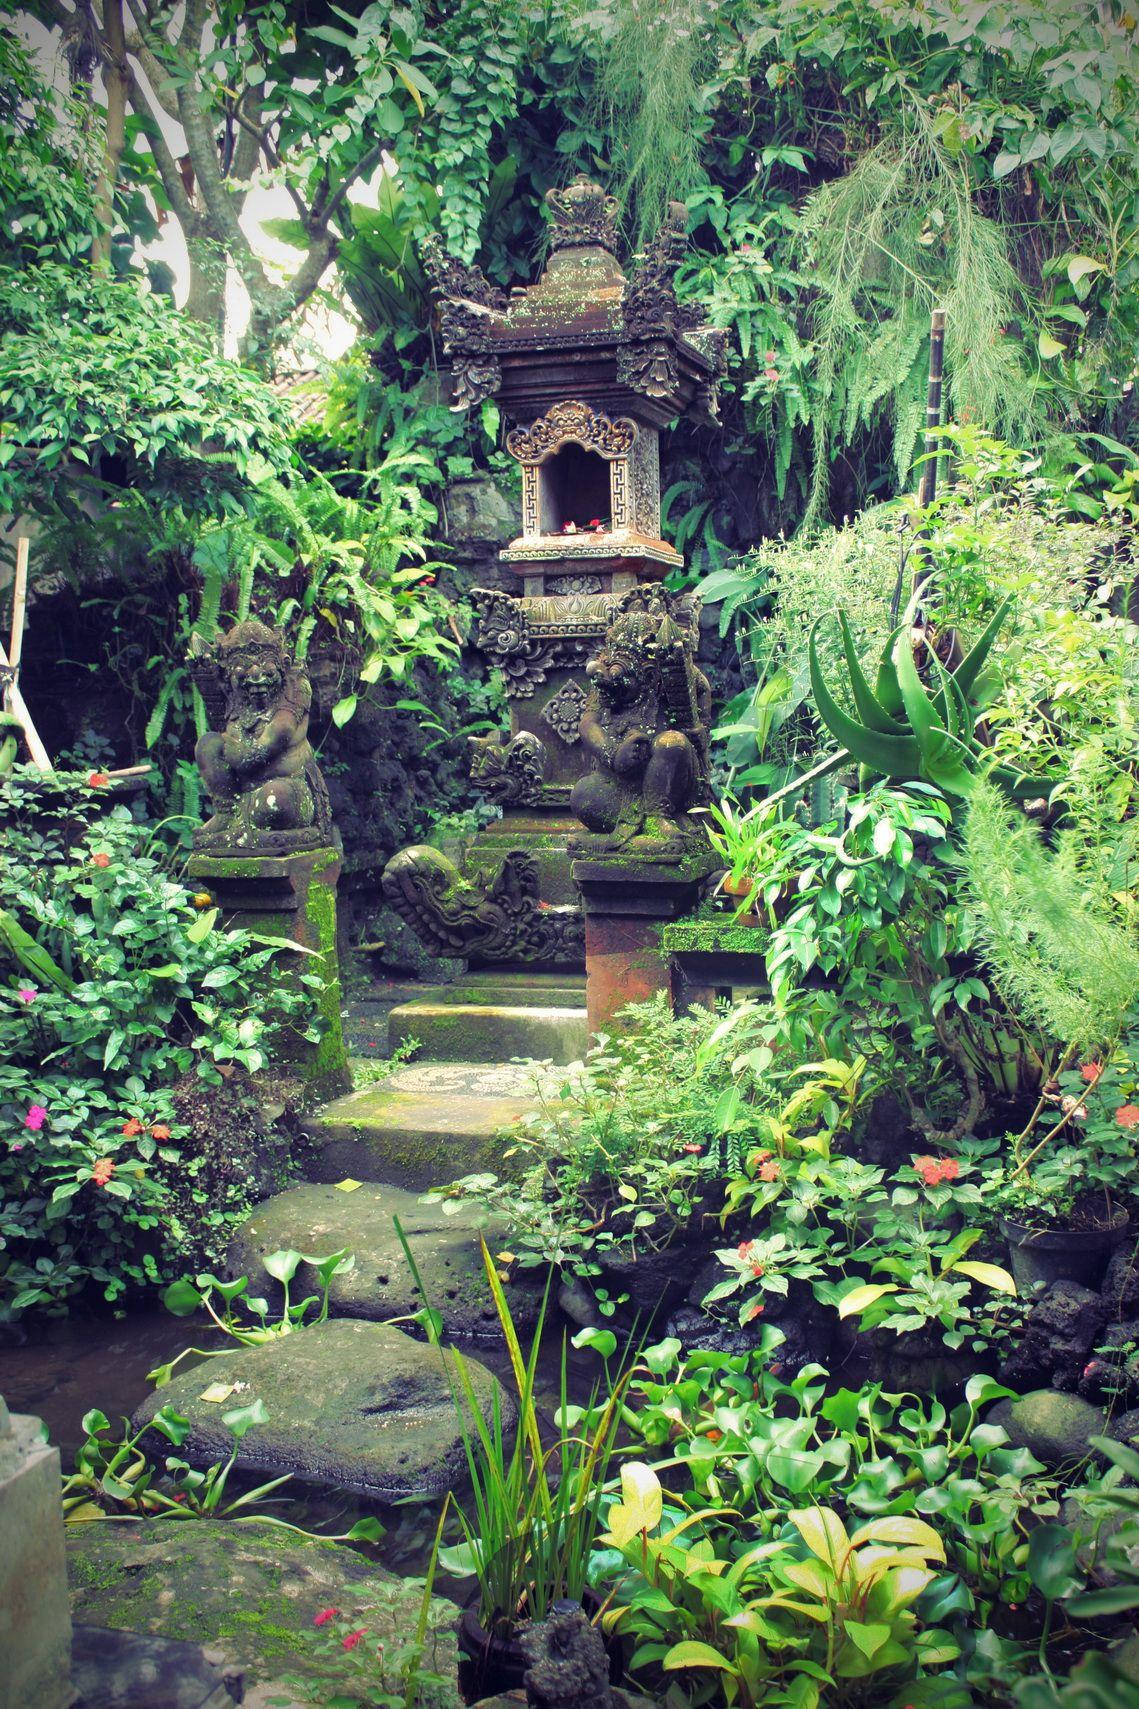 Bali style | Inspiration | Pinterest | Bali style, Balinese garden ...